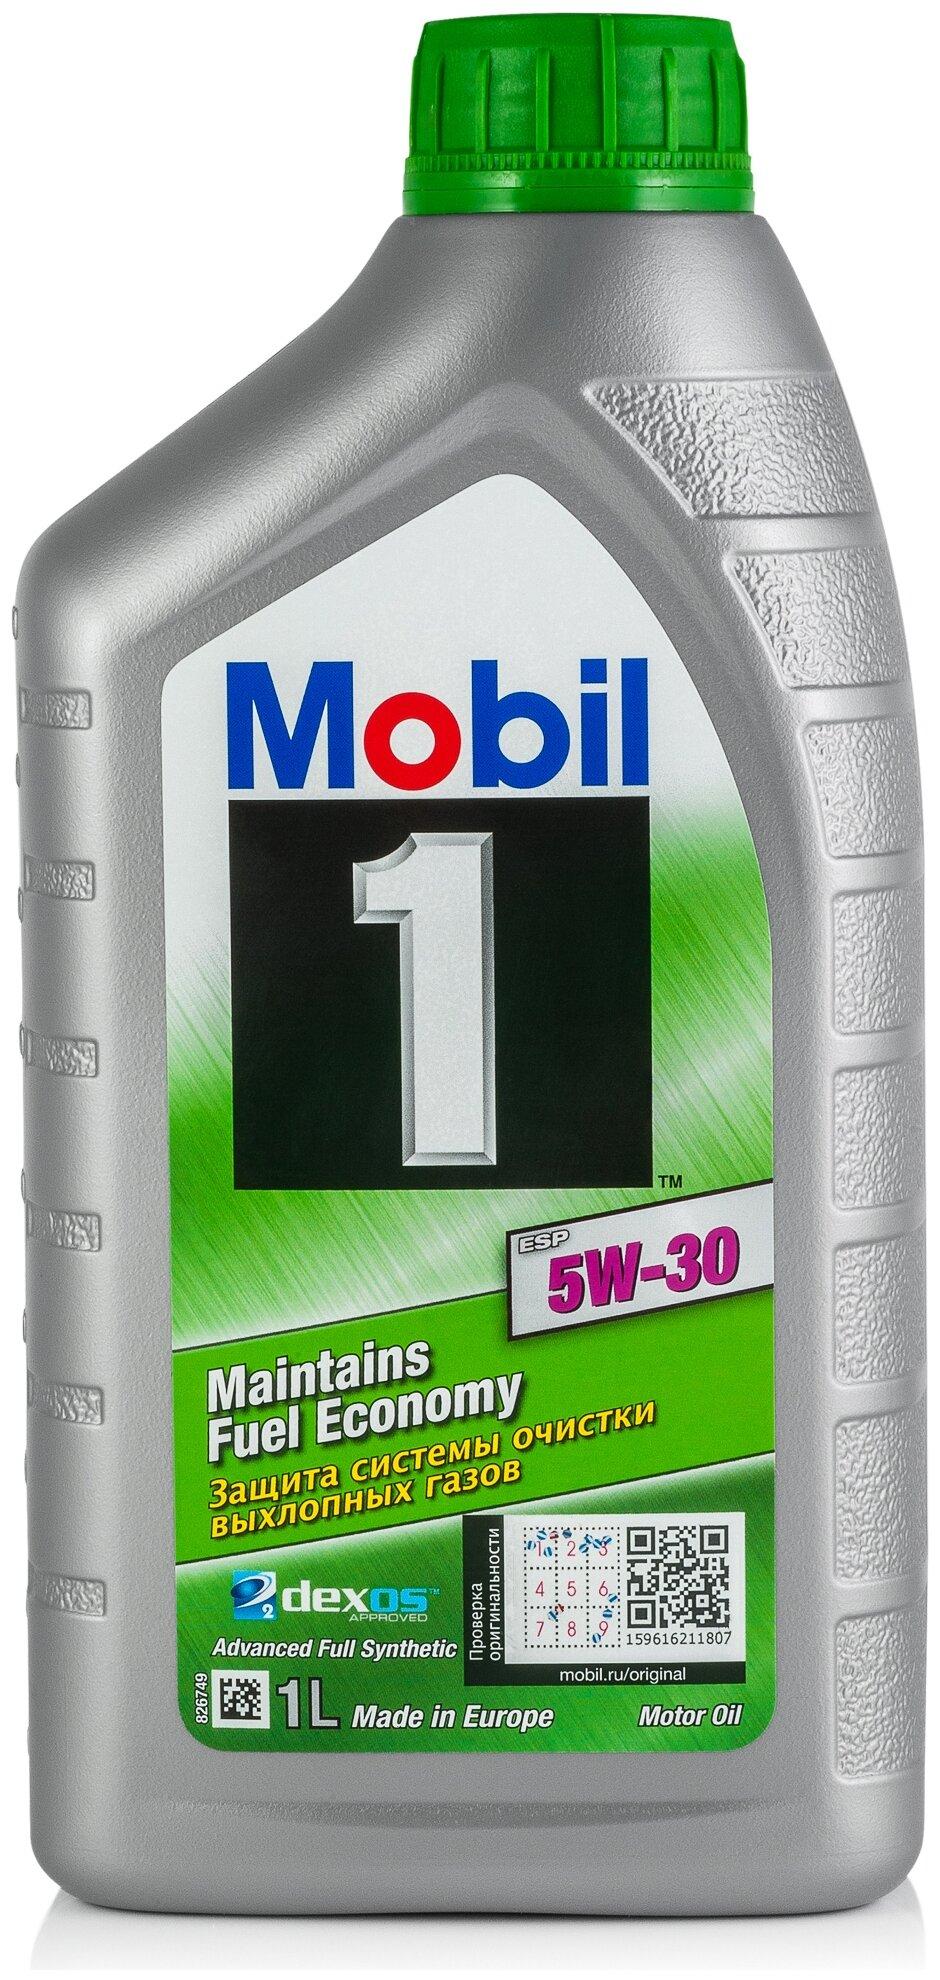 Масло моторное MOBIL M 1 ESP 5W30  1L MB 229.51